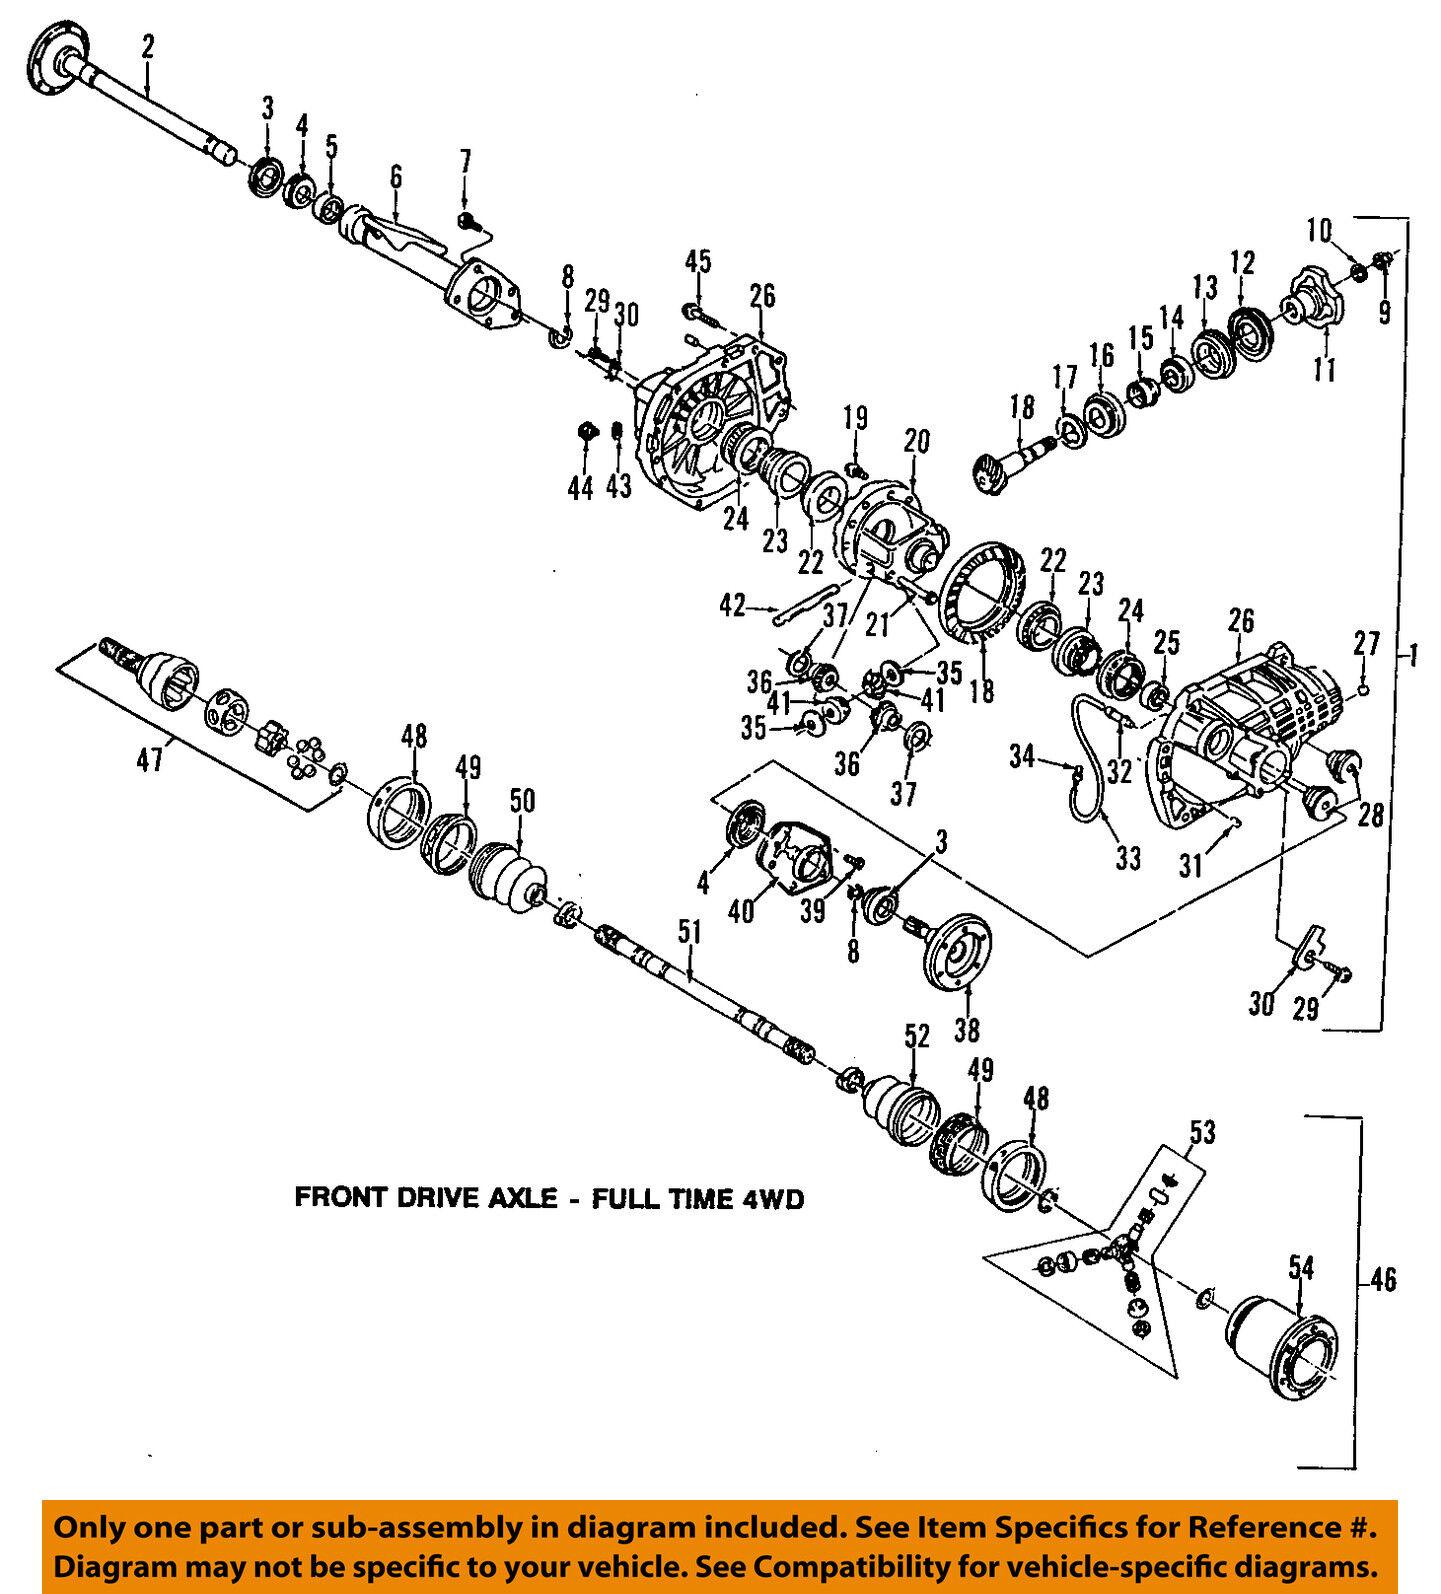 gm 10 bolt differential cross shaft lock bolt for sale online | ebay  ebay